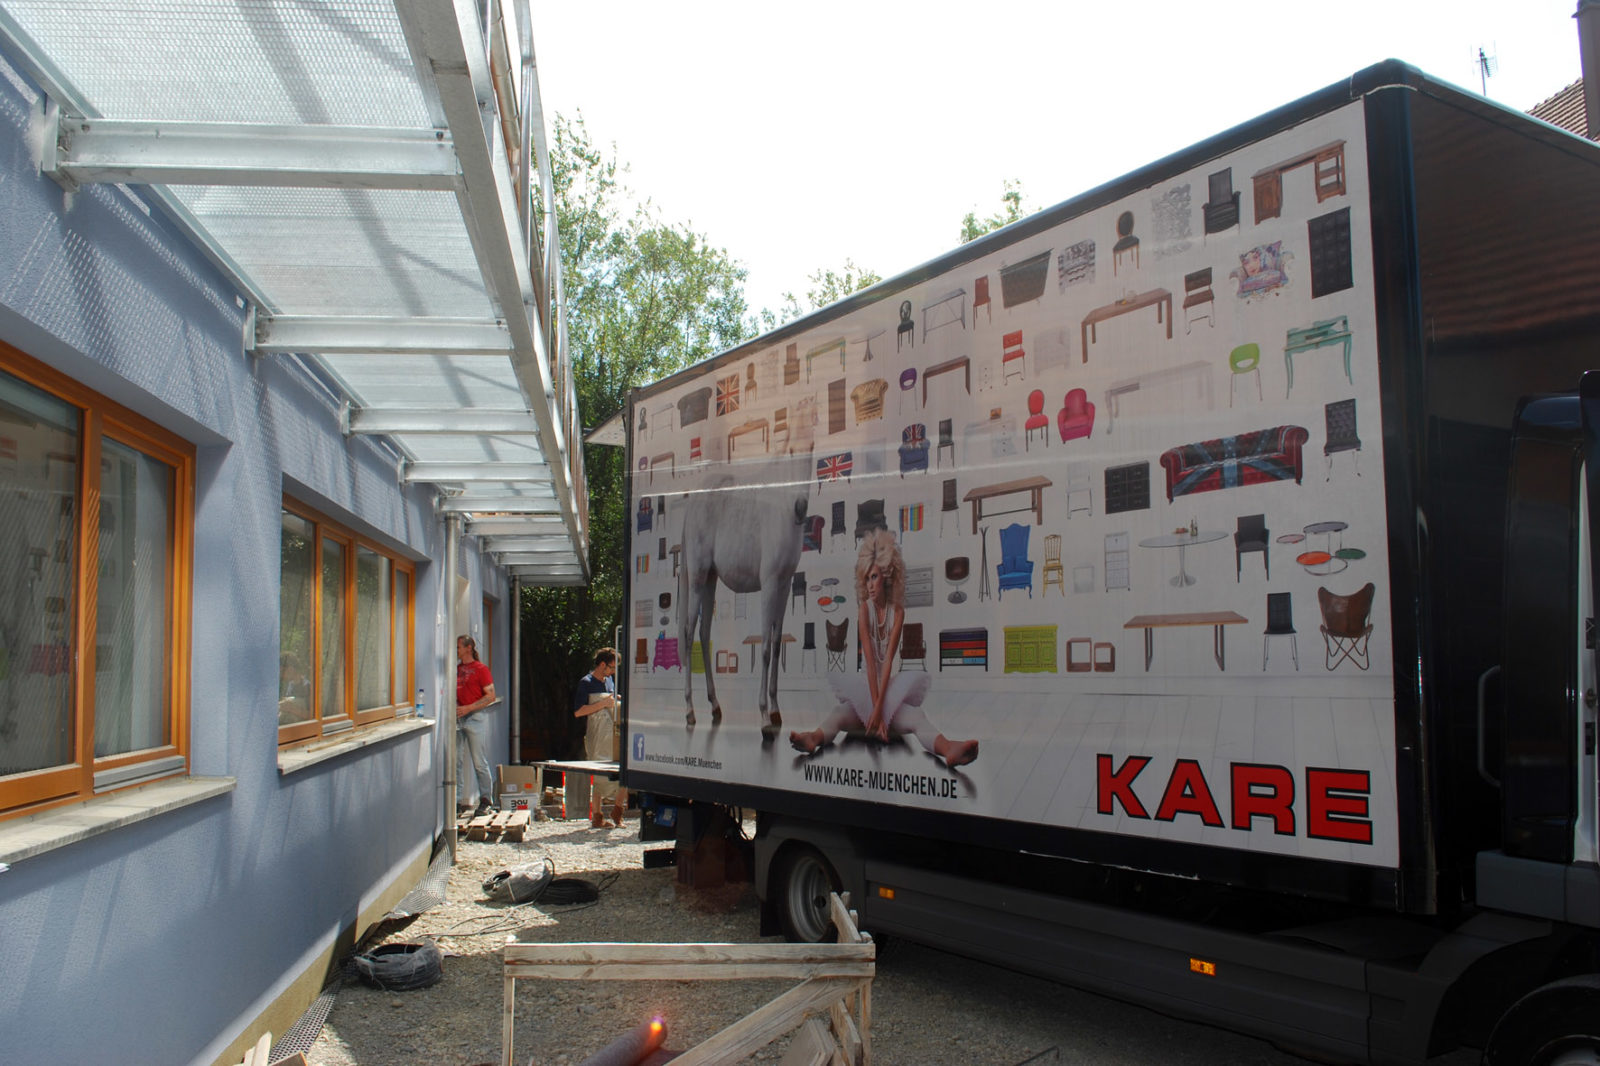 Social Day Kare 2013 Weicht